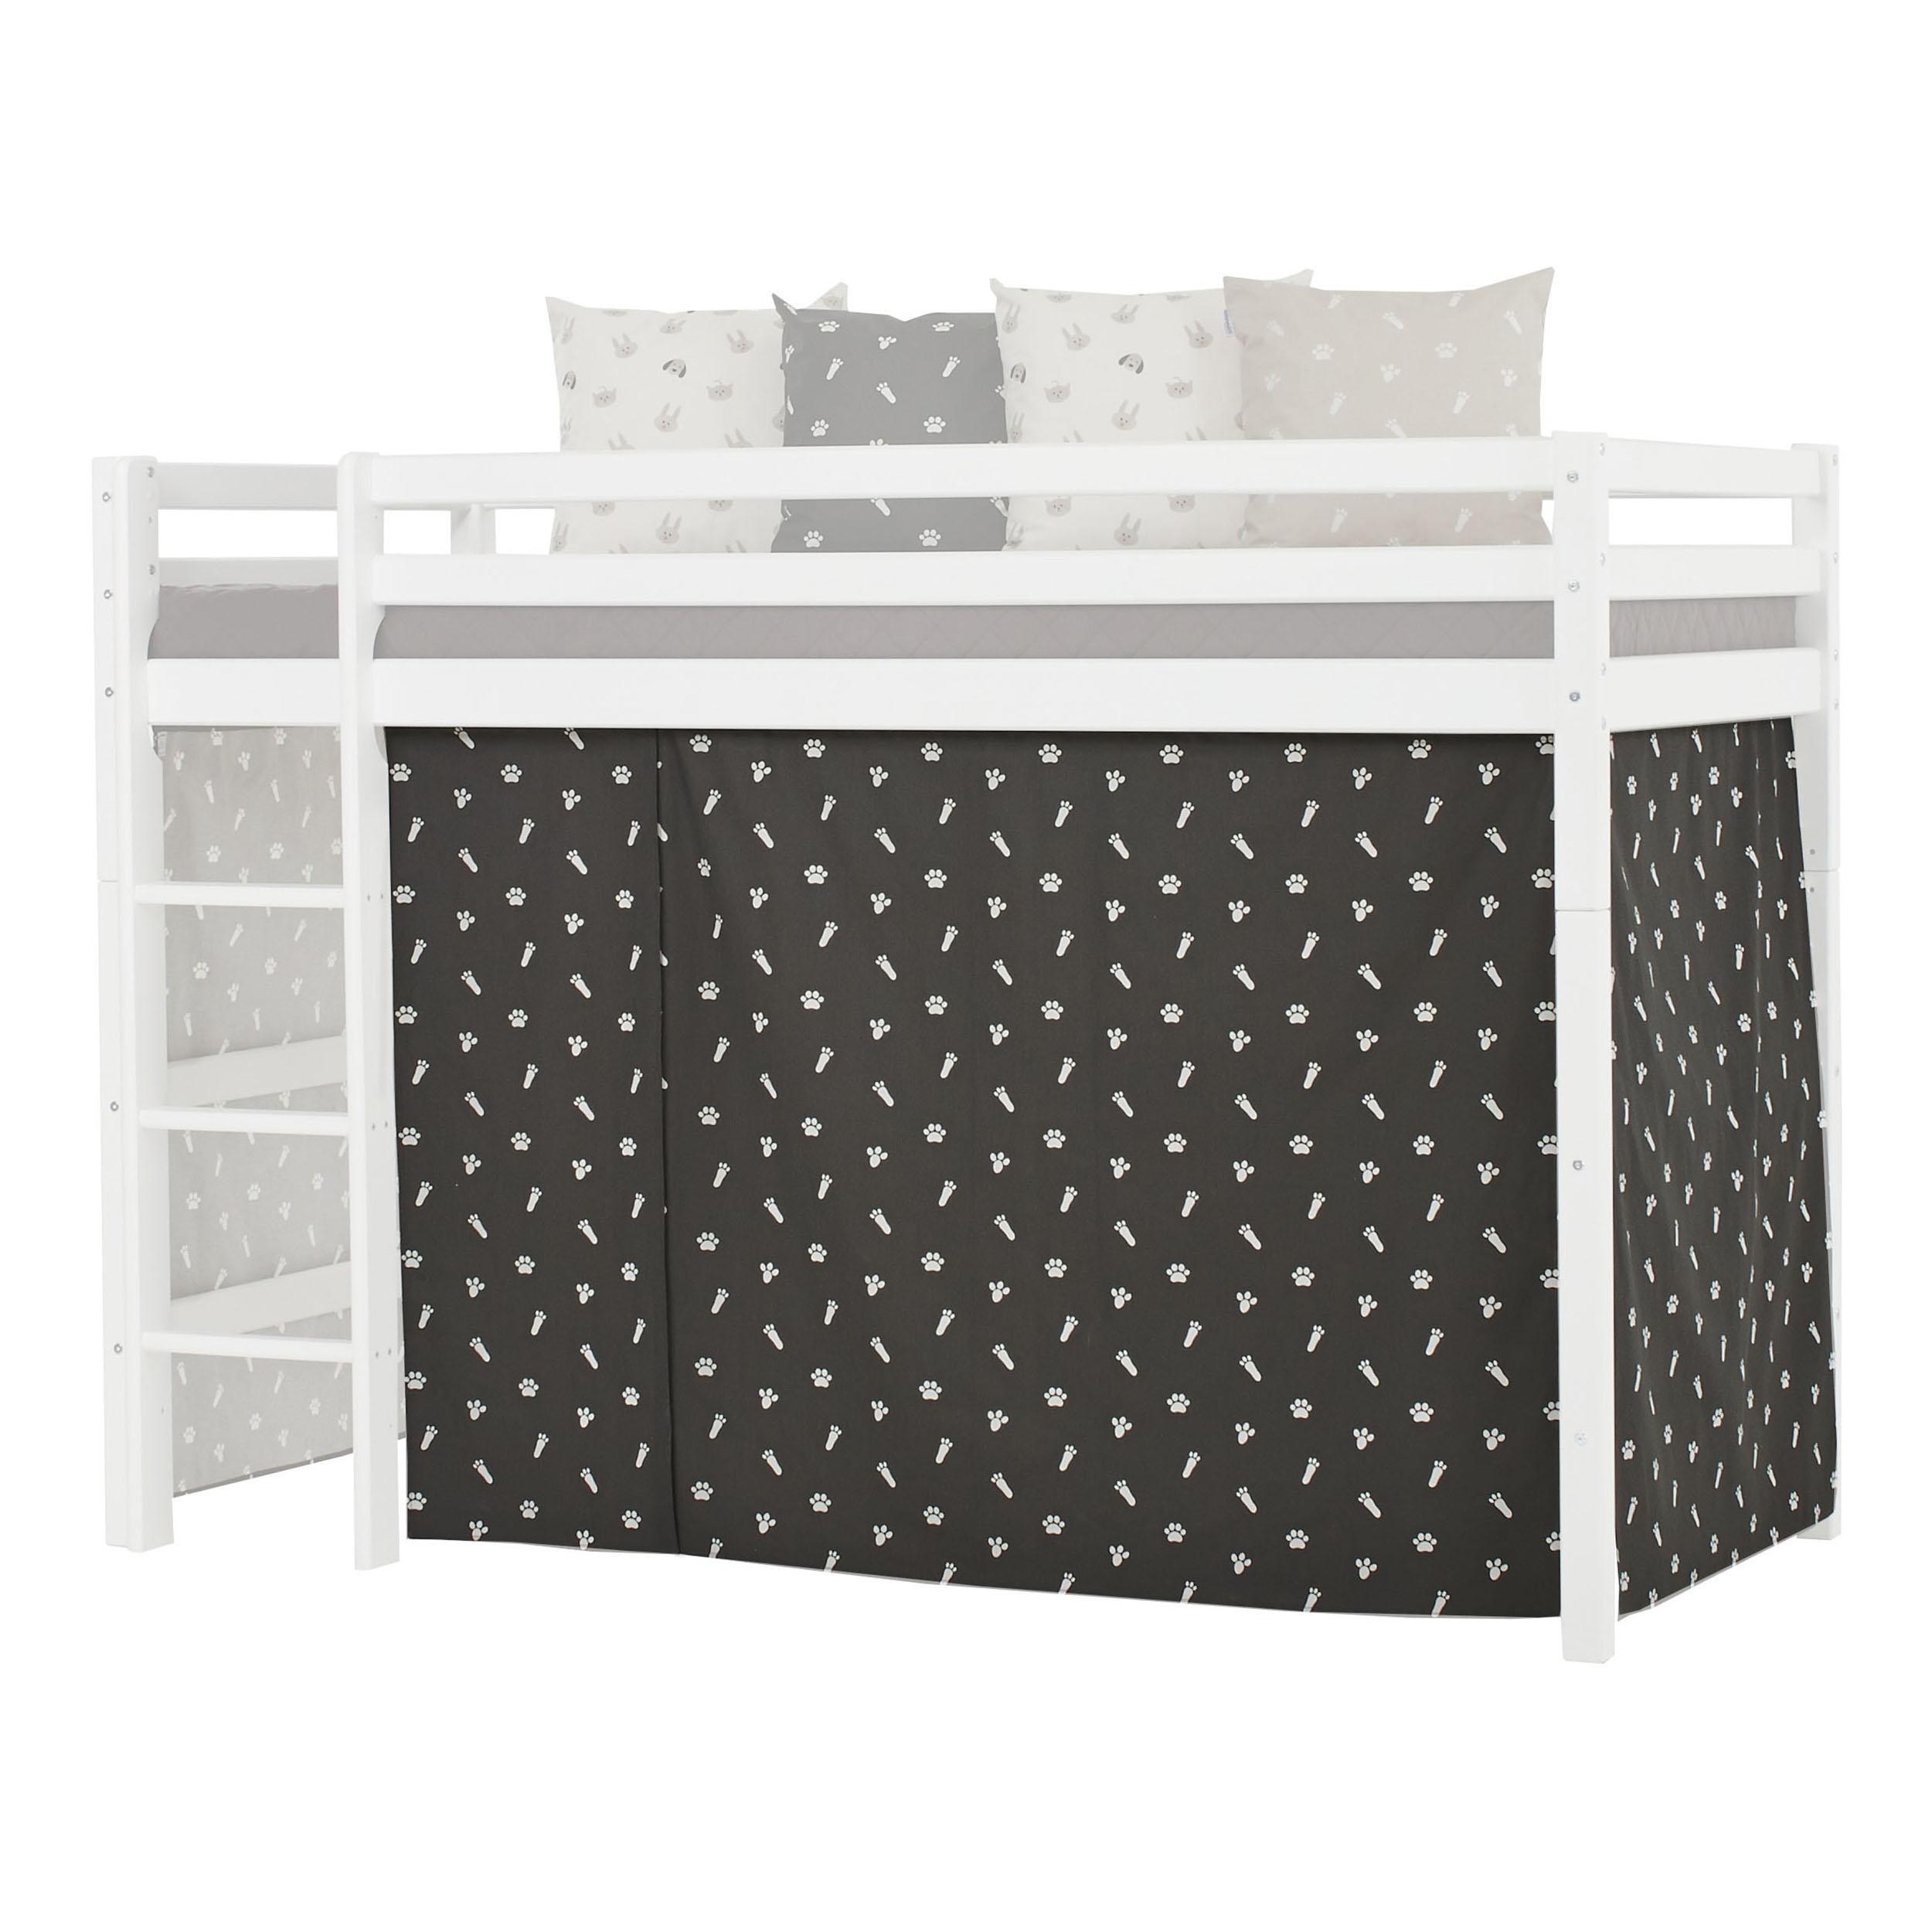 Hoppekids - Play Curtain Mid-High Bed 90x200 cm - Pets Granite Grey